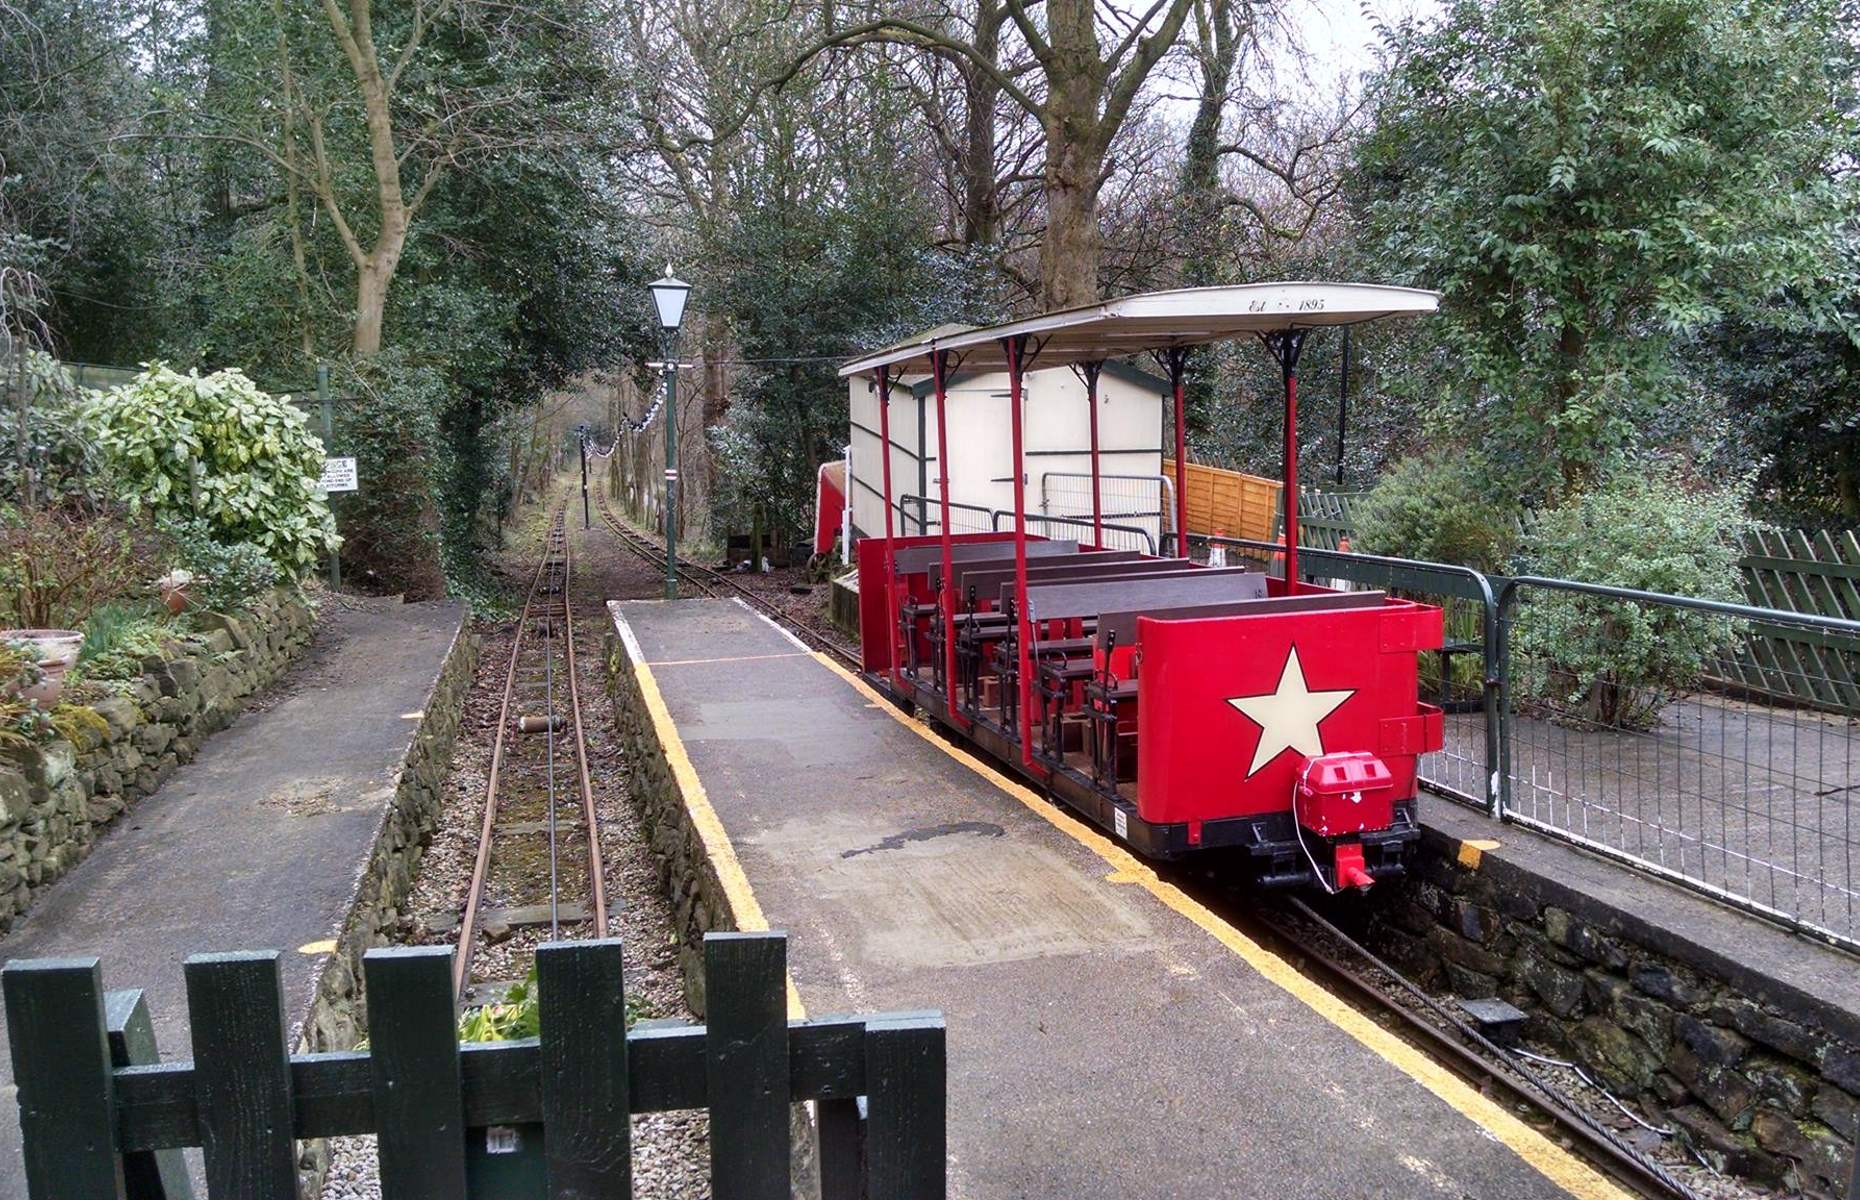 Shipley Glen Tramway (Image: Shipley Glen Tramway/Facebook)